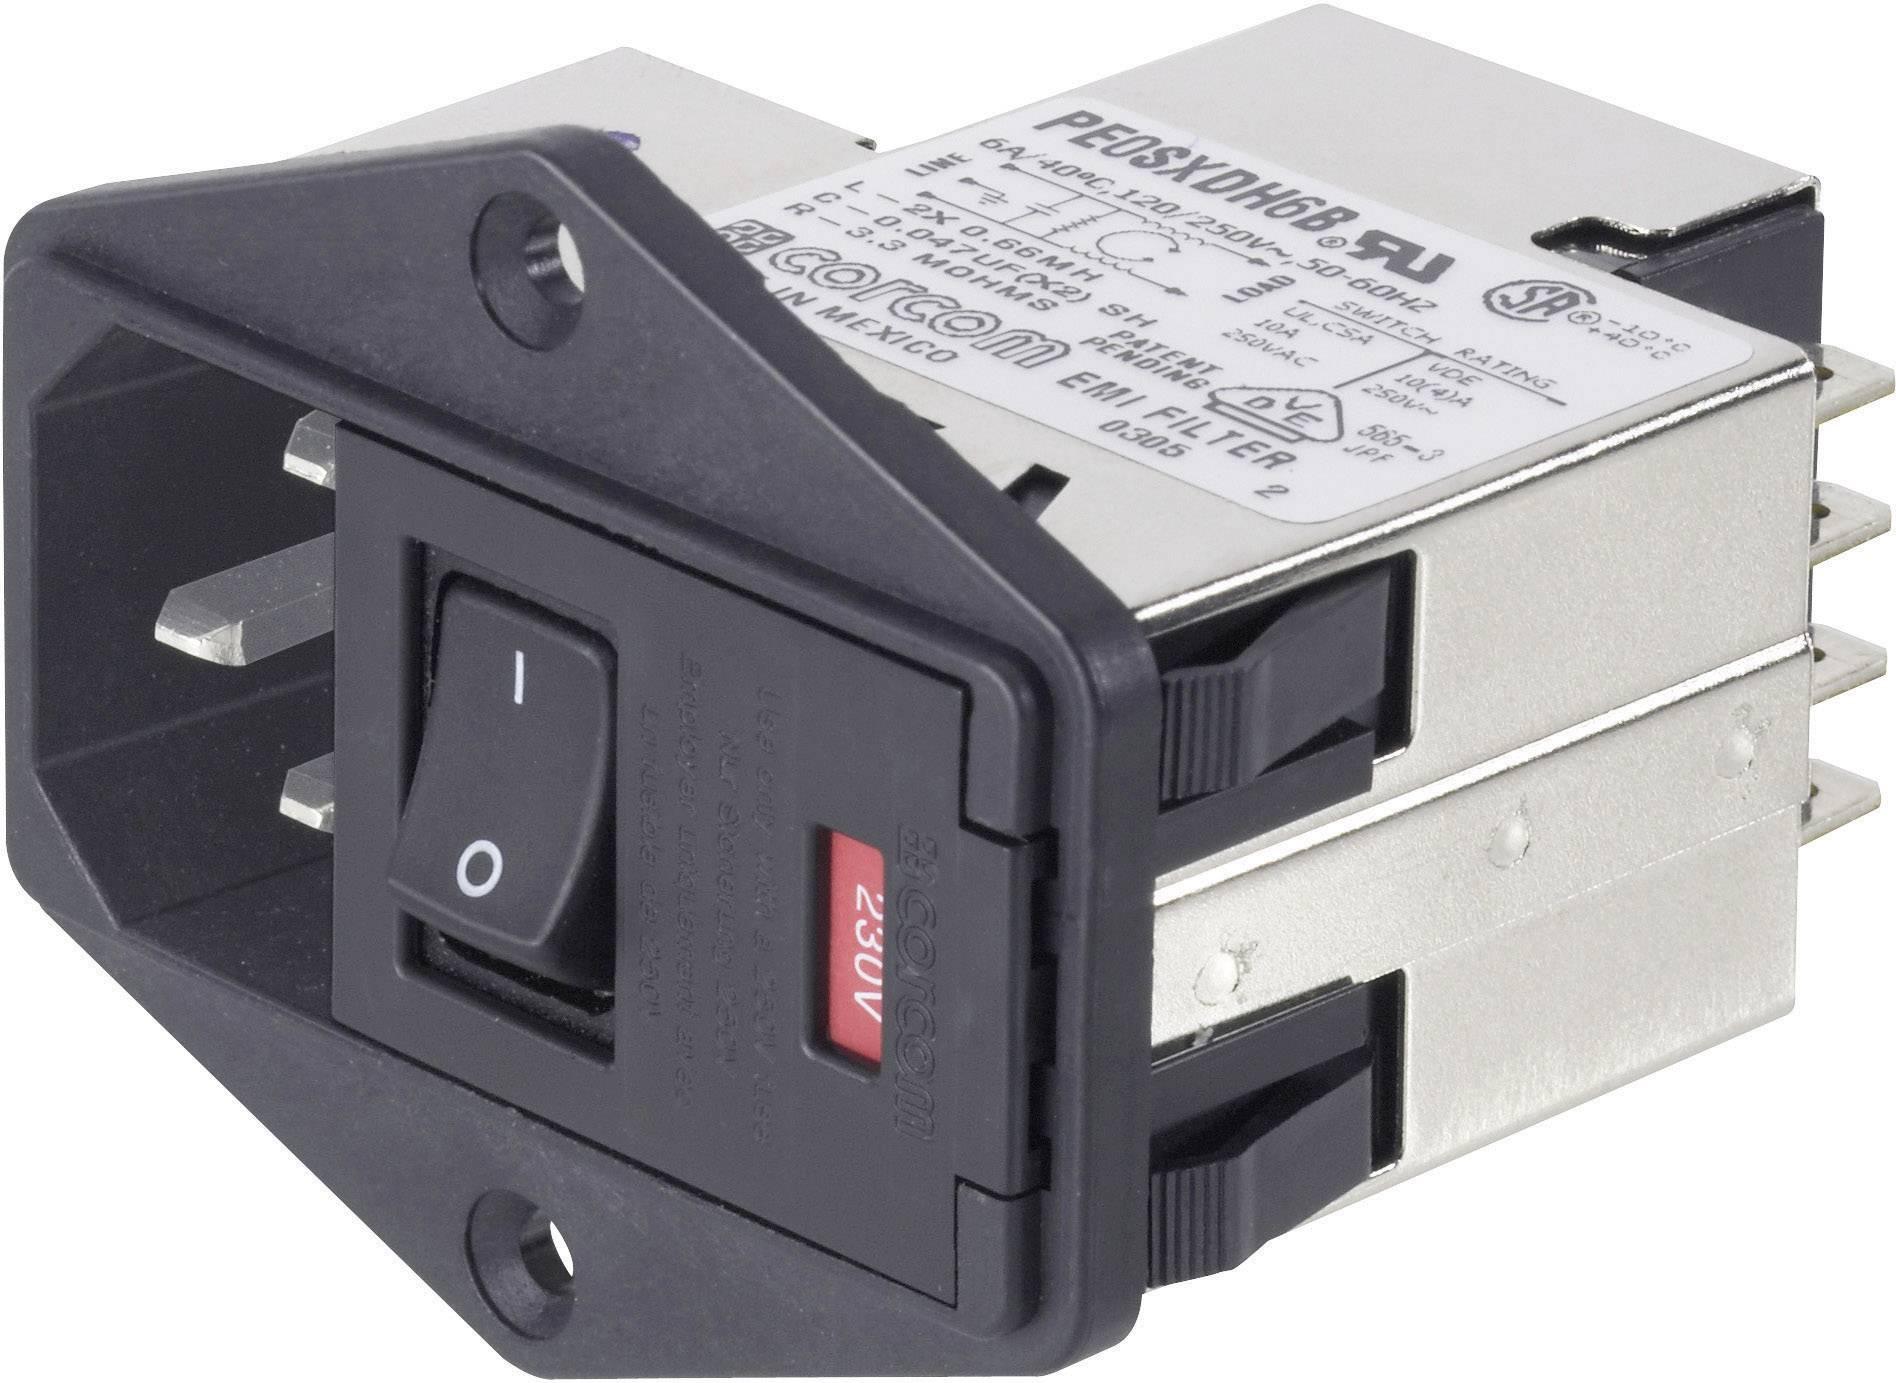 Síťový filtr TE Connectivity, PE0SXDSXA=C2228, 250 V/AC, 10 A